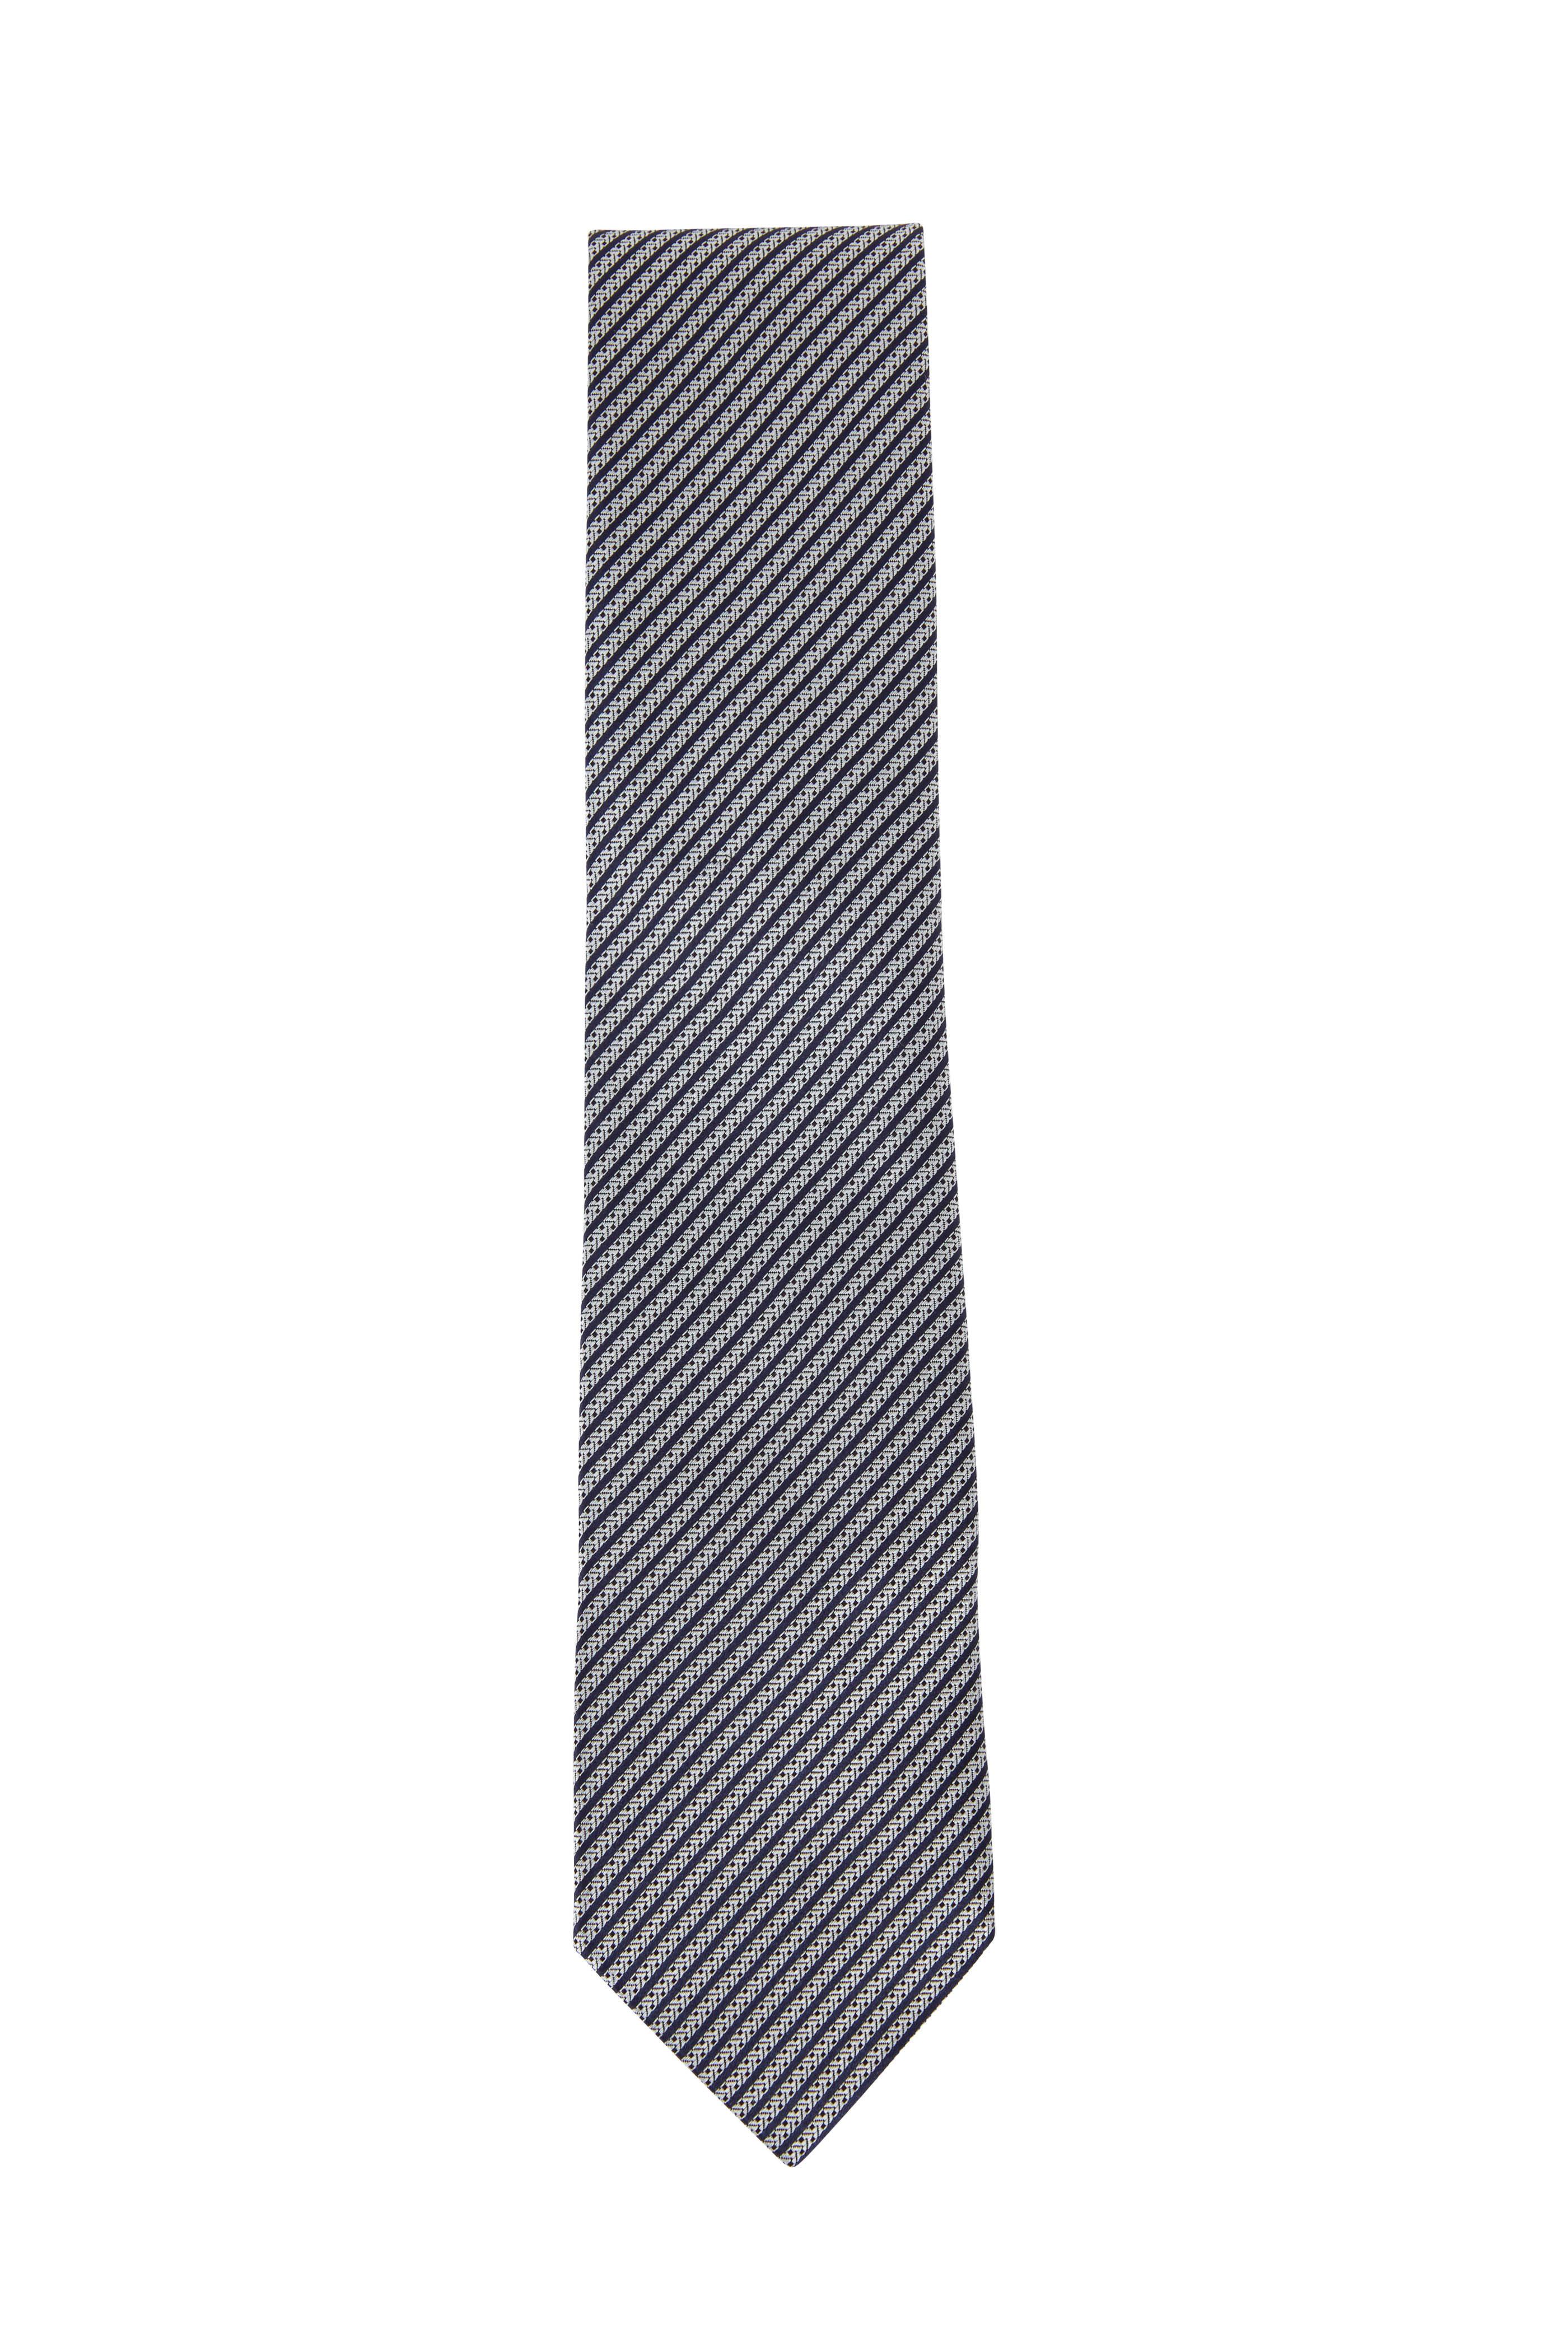 d3e8a0ad70 Ermenegildo Zegna - Silver & Black Skinny Striped Silk Necktie ...